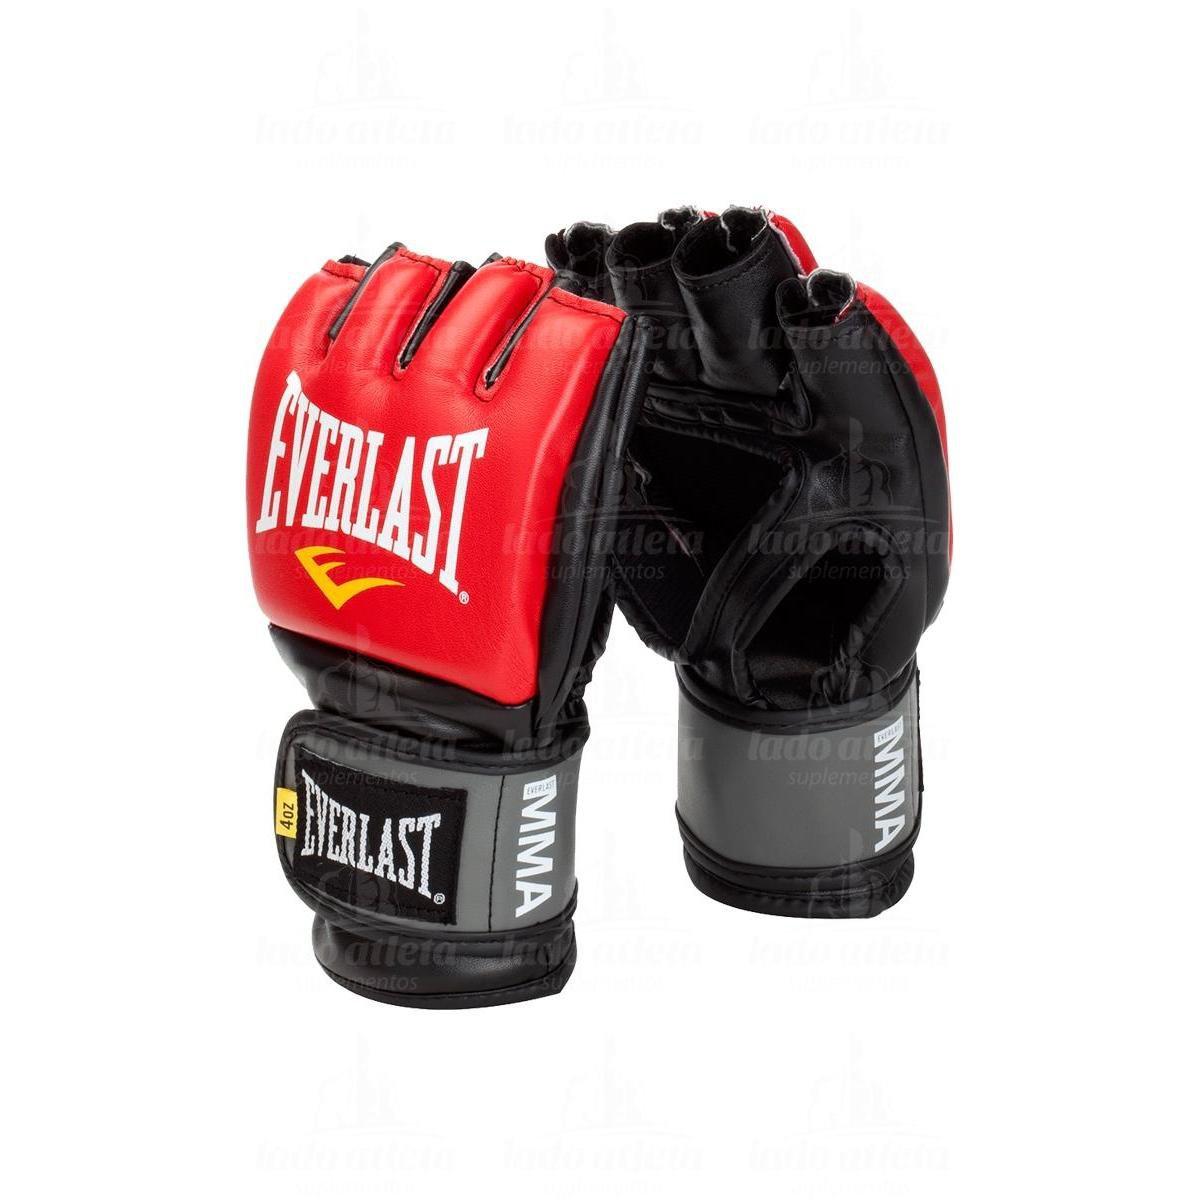 Luva Mma Pro Style Grappling - Everlast - Vermelho e Preto - Compre ... bef0b5e5e5282